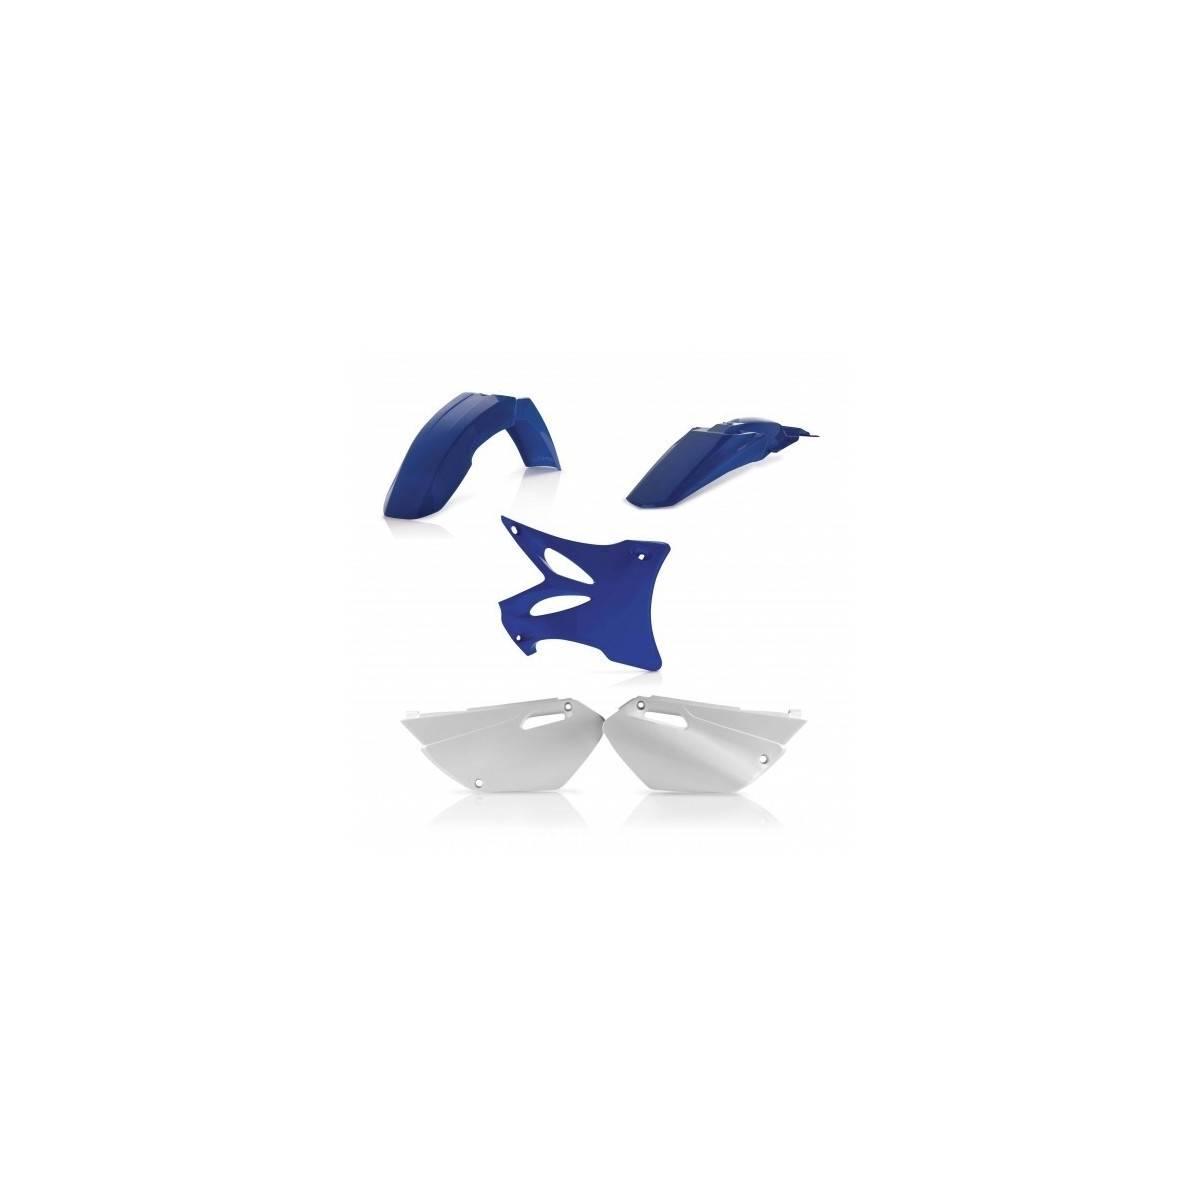 0023090-553 - Kit Plasticos Wrf 450 18 Origen